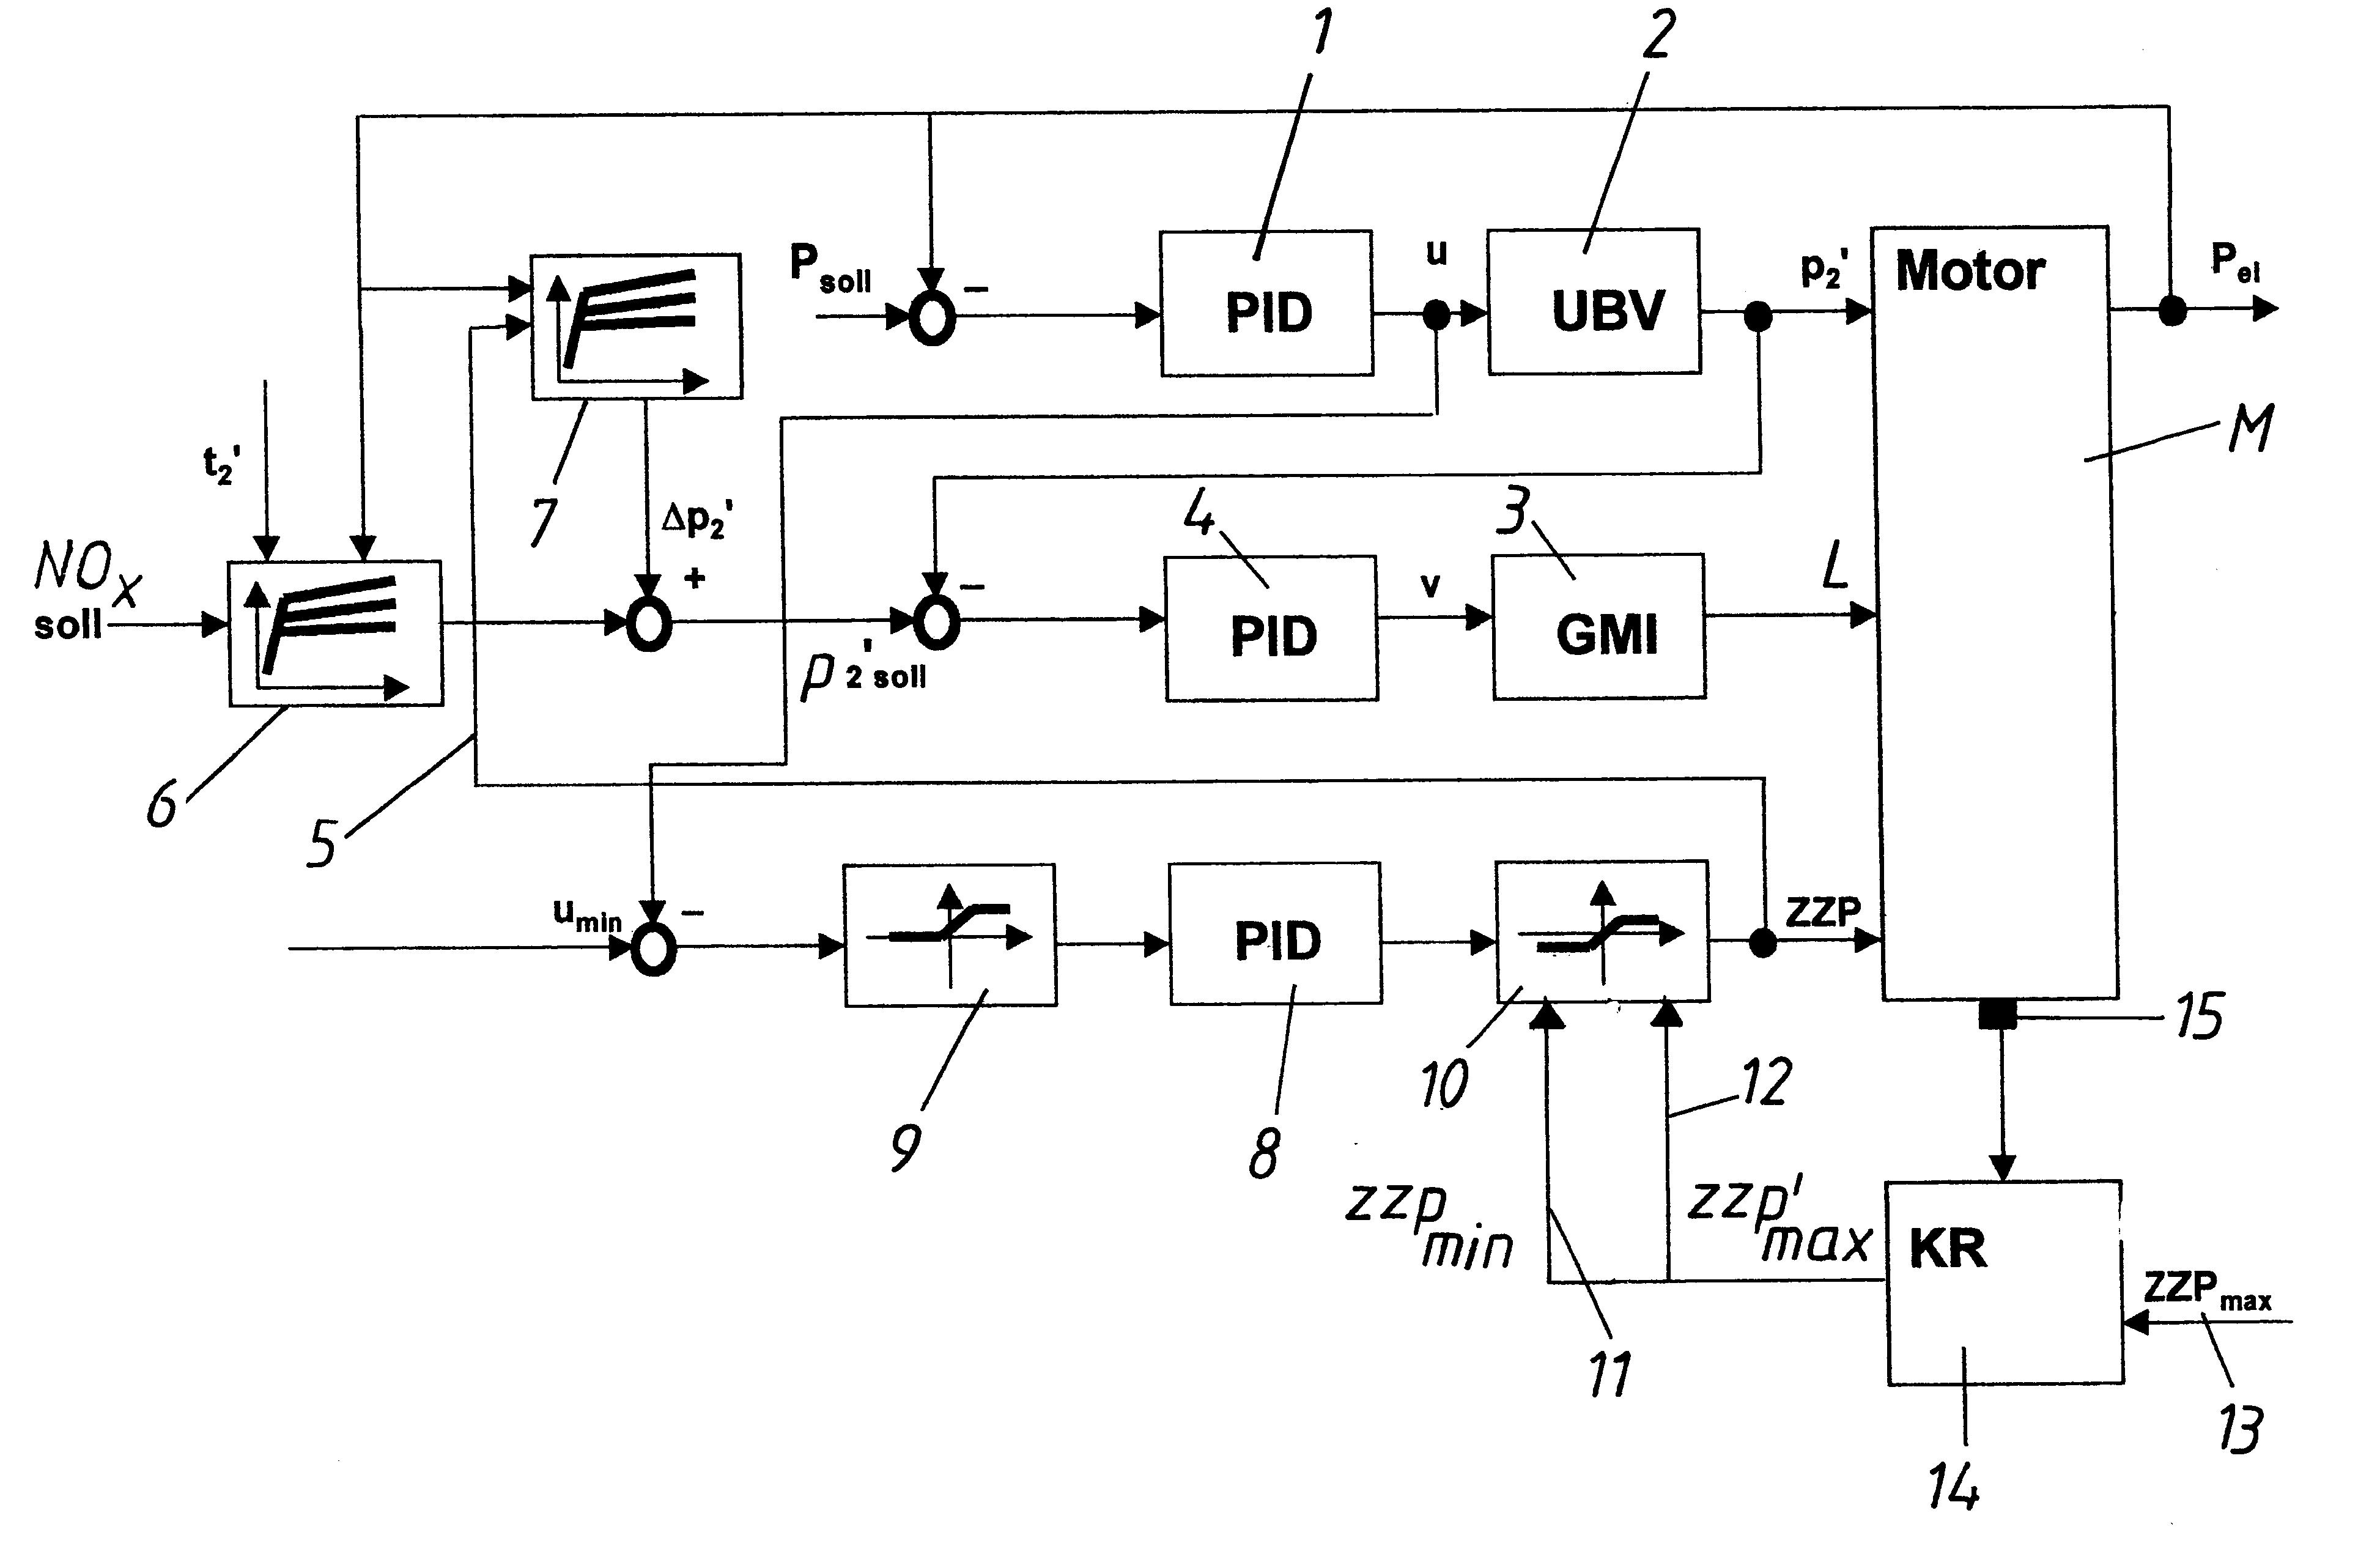 Patent Us6766786 Arrangement For Regulating A Spark Ignition External Combustion Engine Diagram Drawing